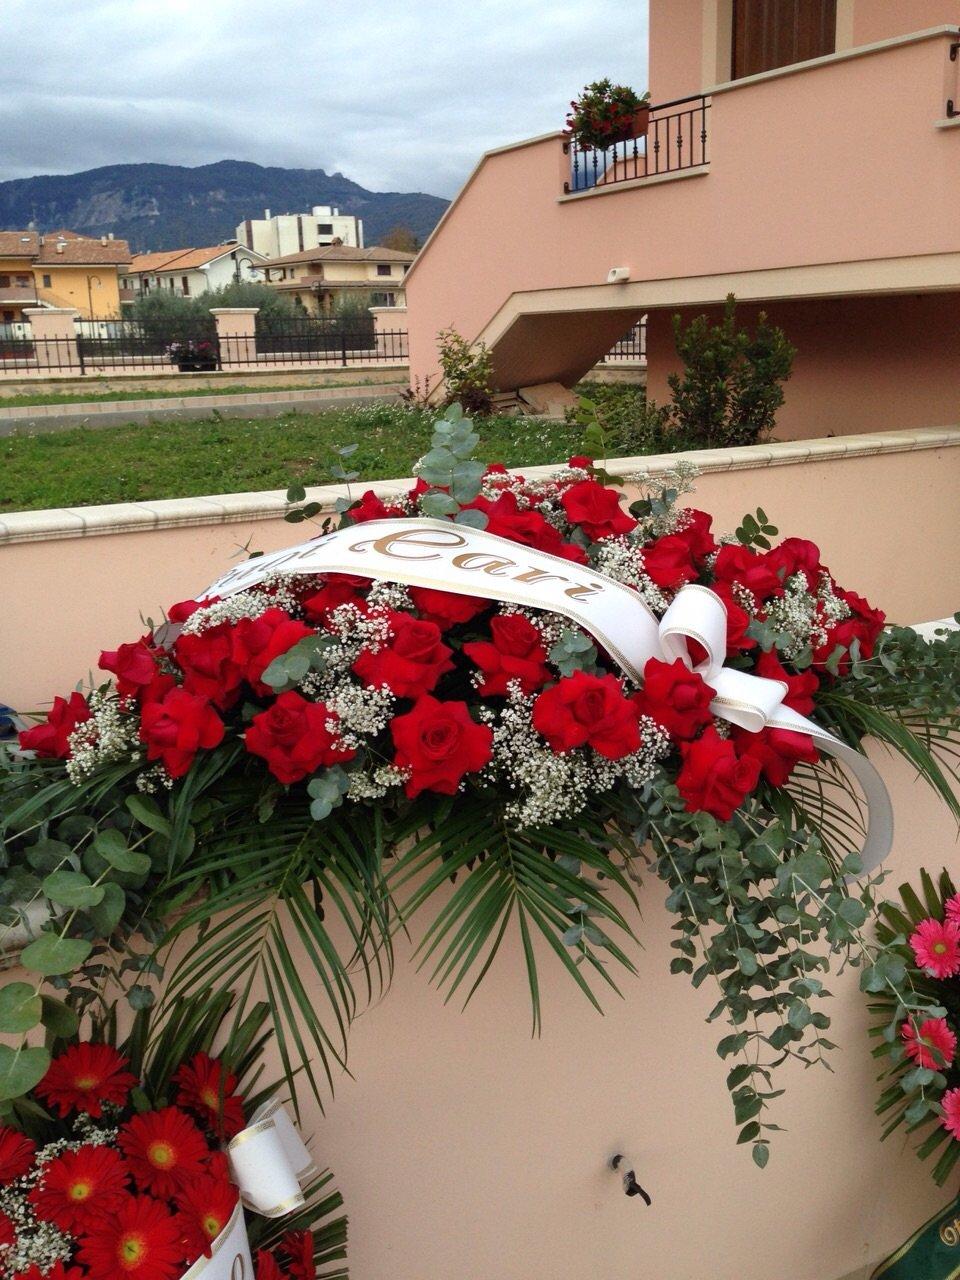 corona funebre di rose rosse